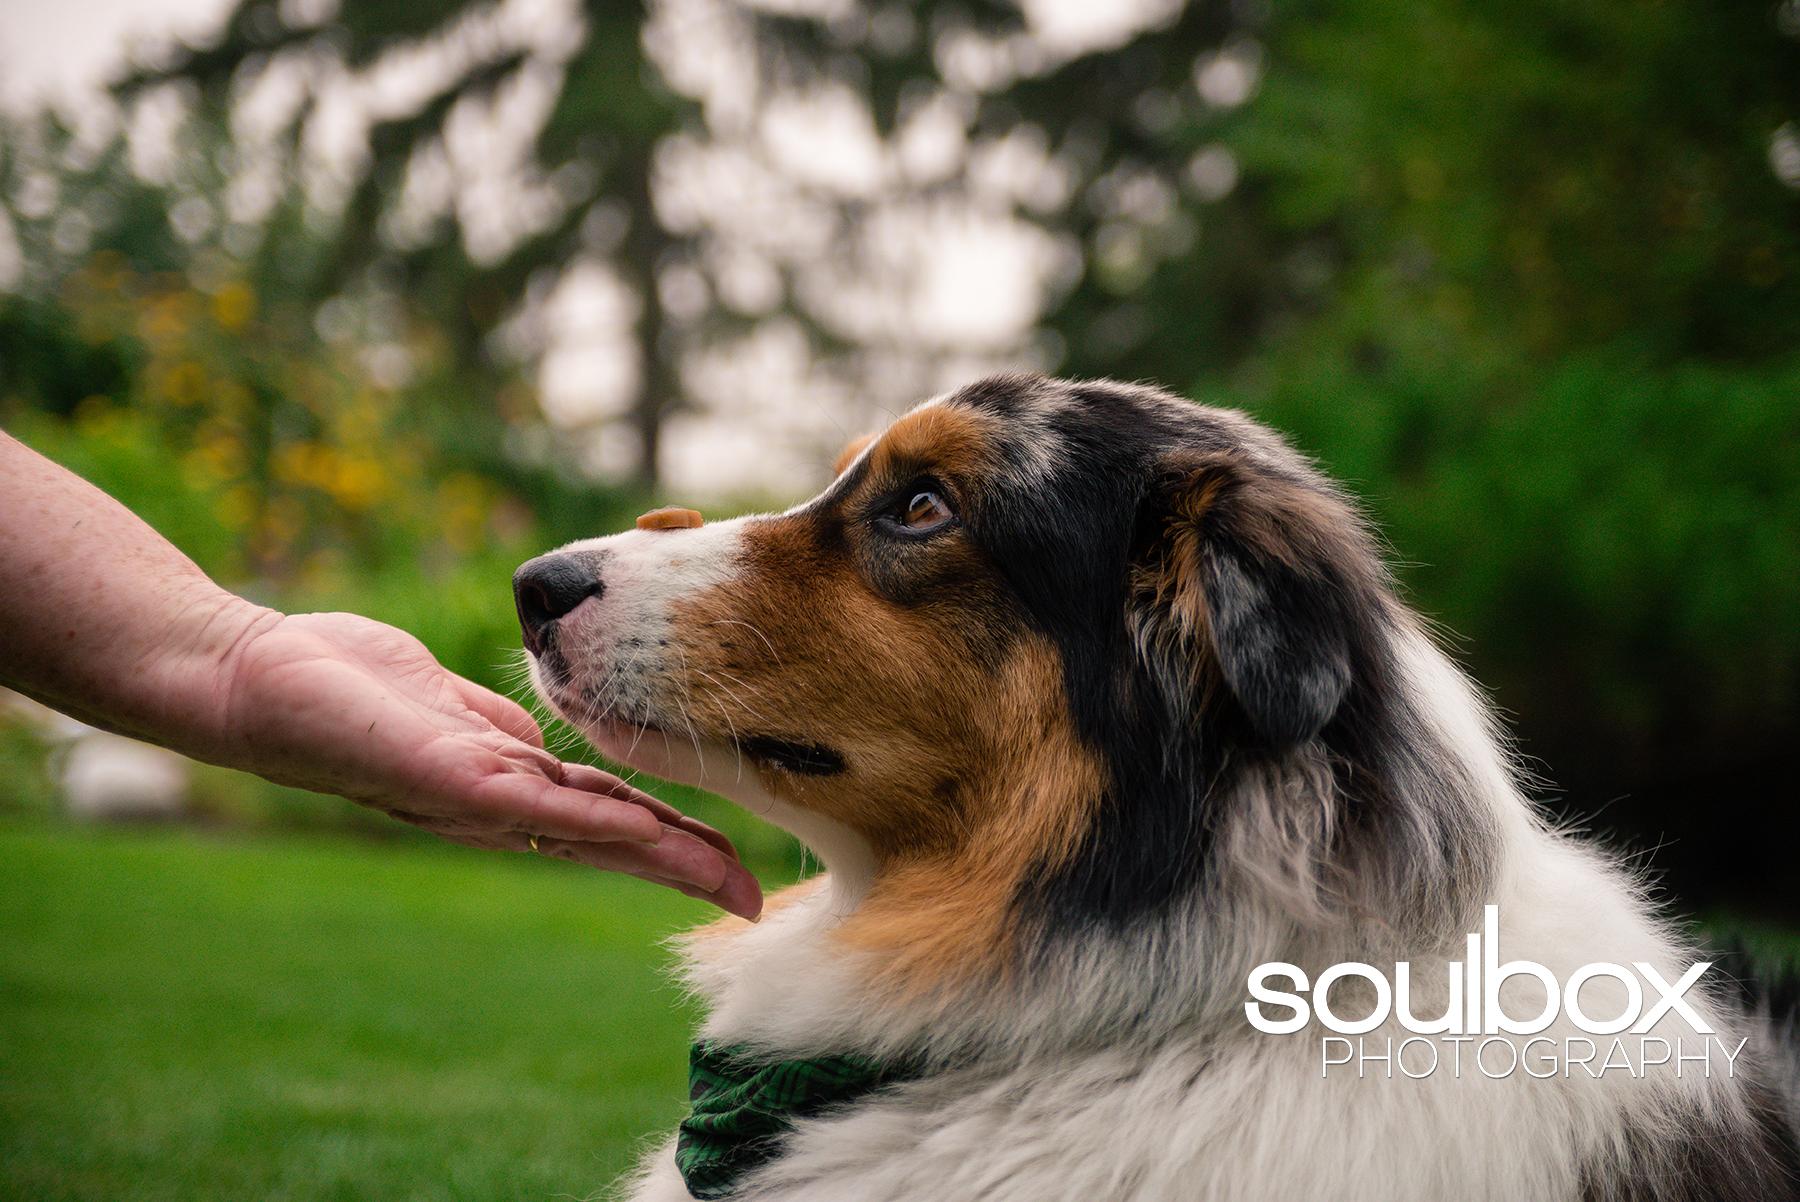 SoulboxPhotographyPetPhotography-1.jpg